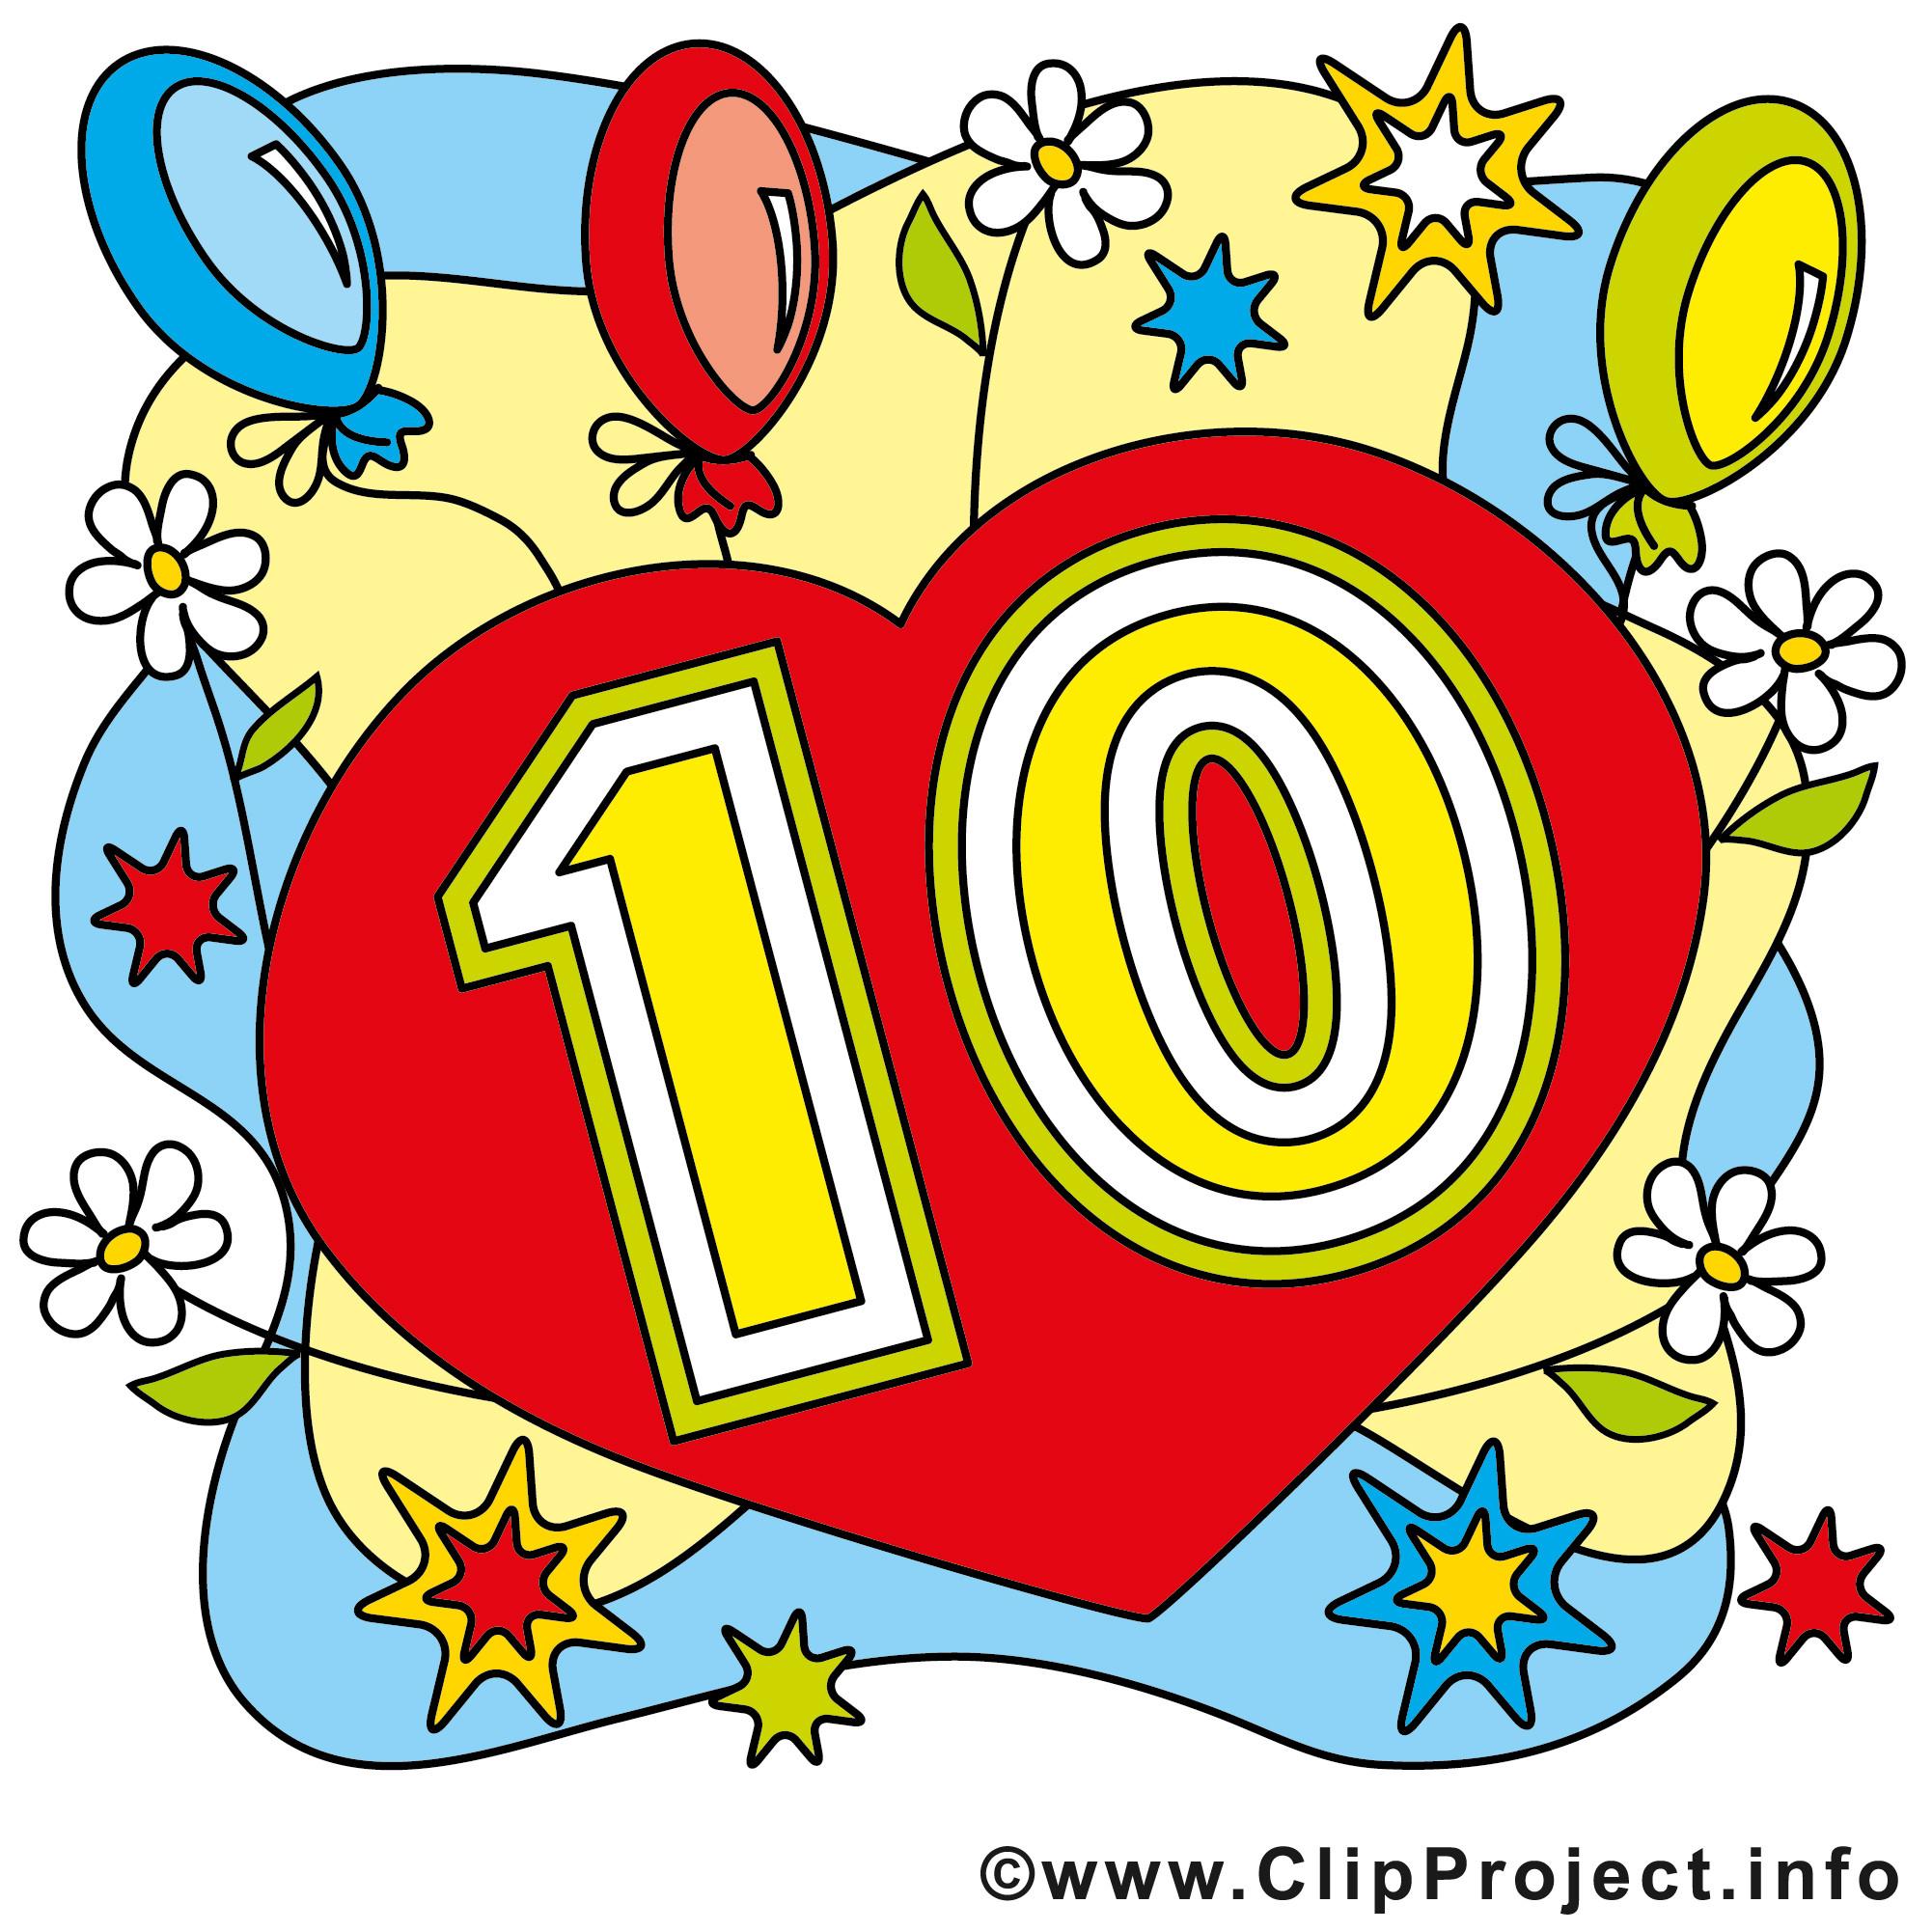 Geburtstagsparty Clipart  Clip art geburtstag einladung BBCpersian7 collections